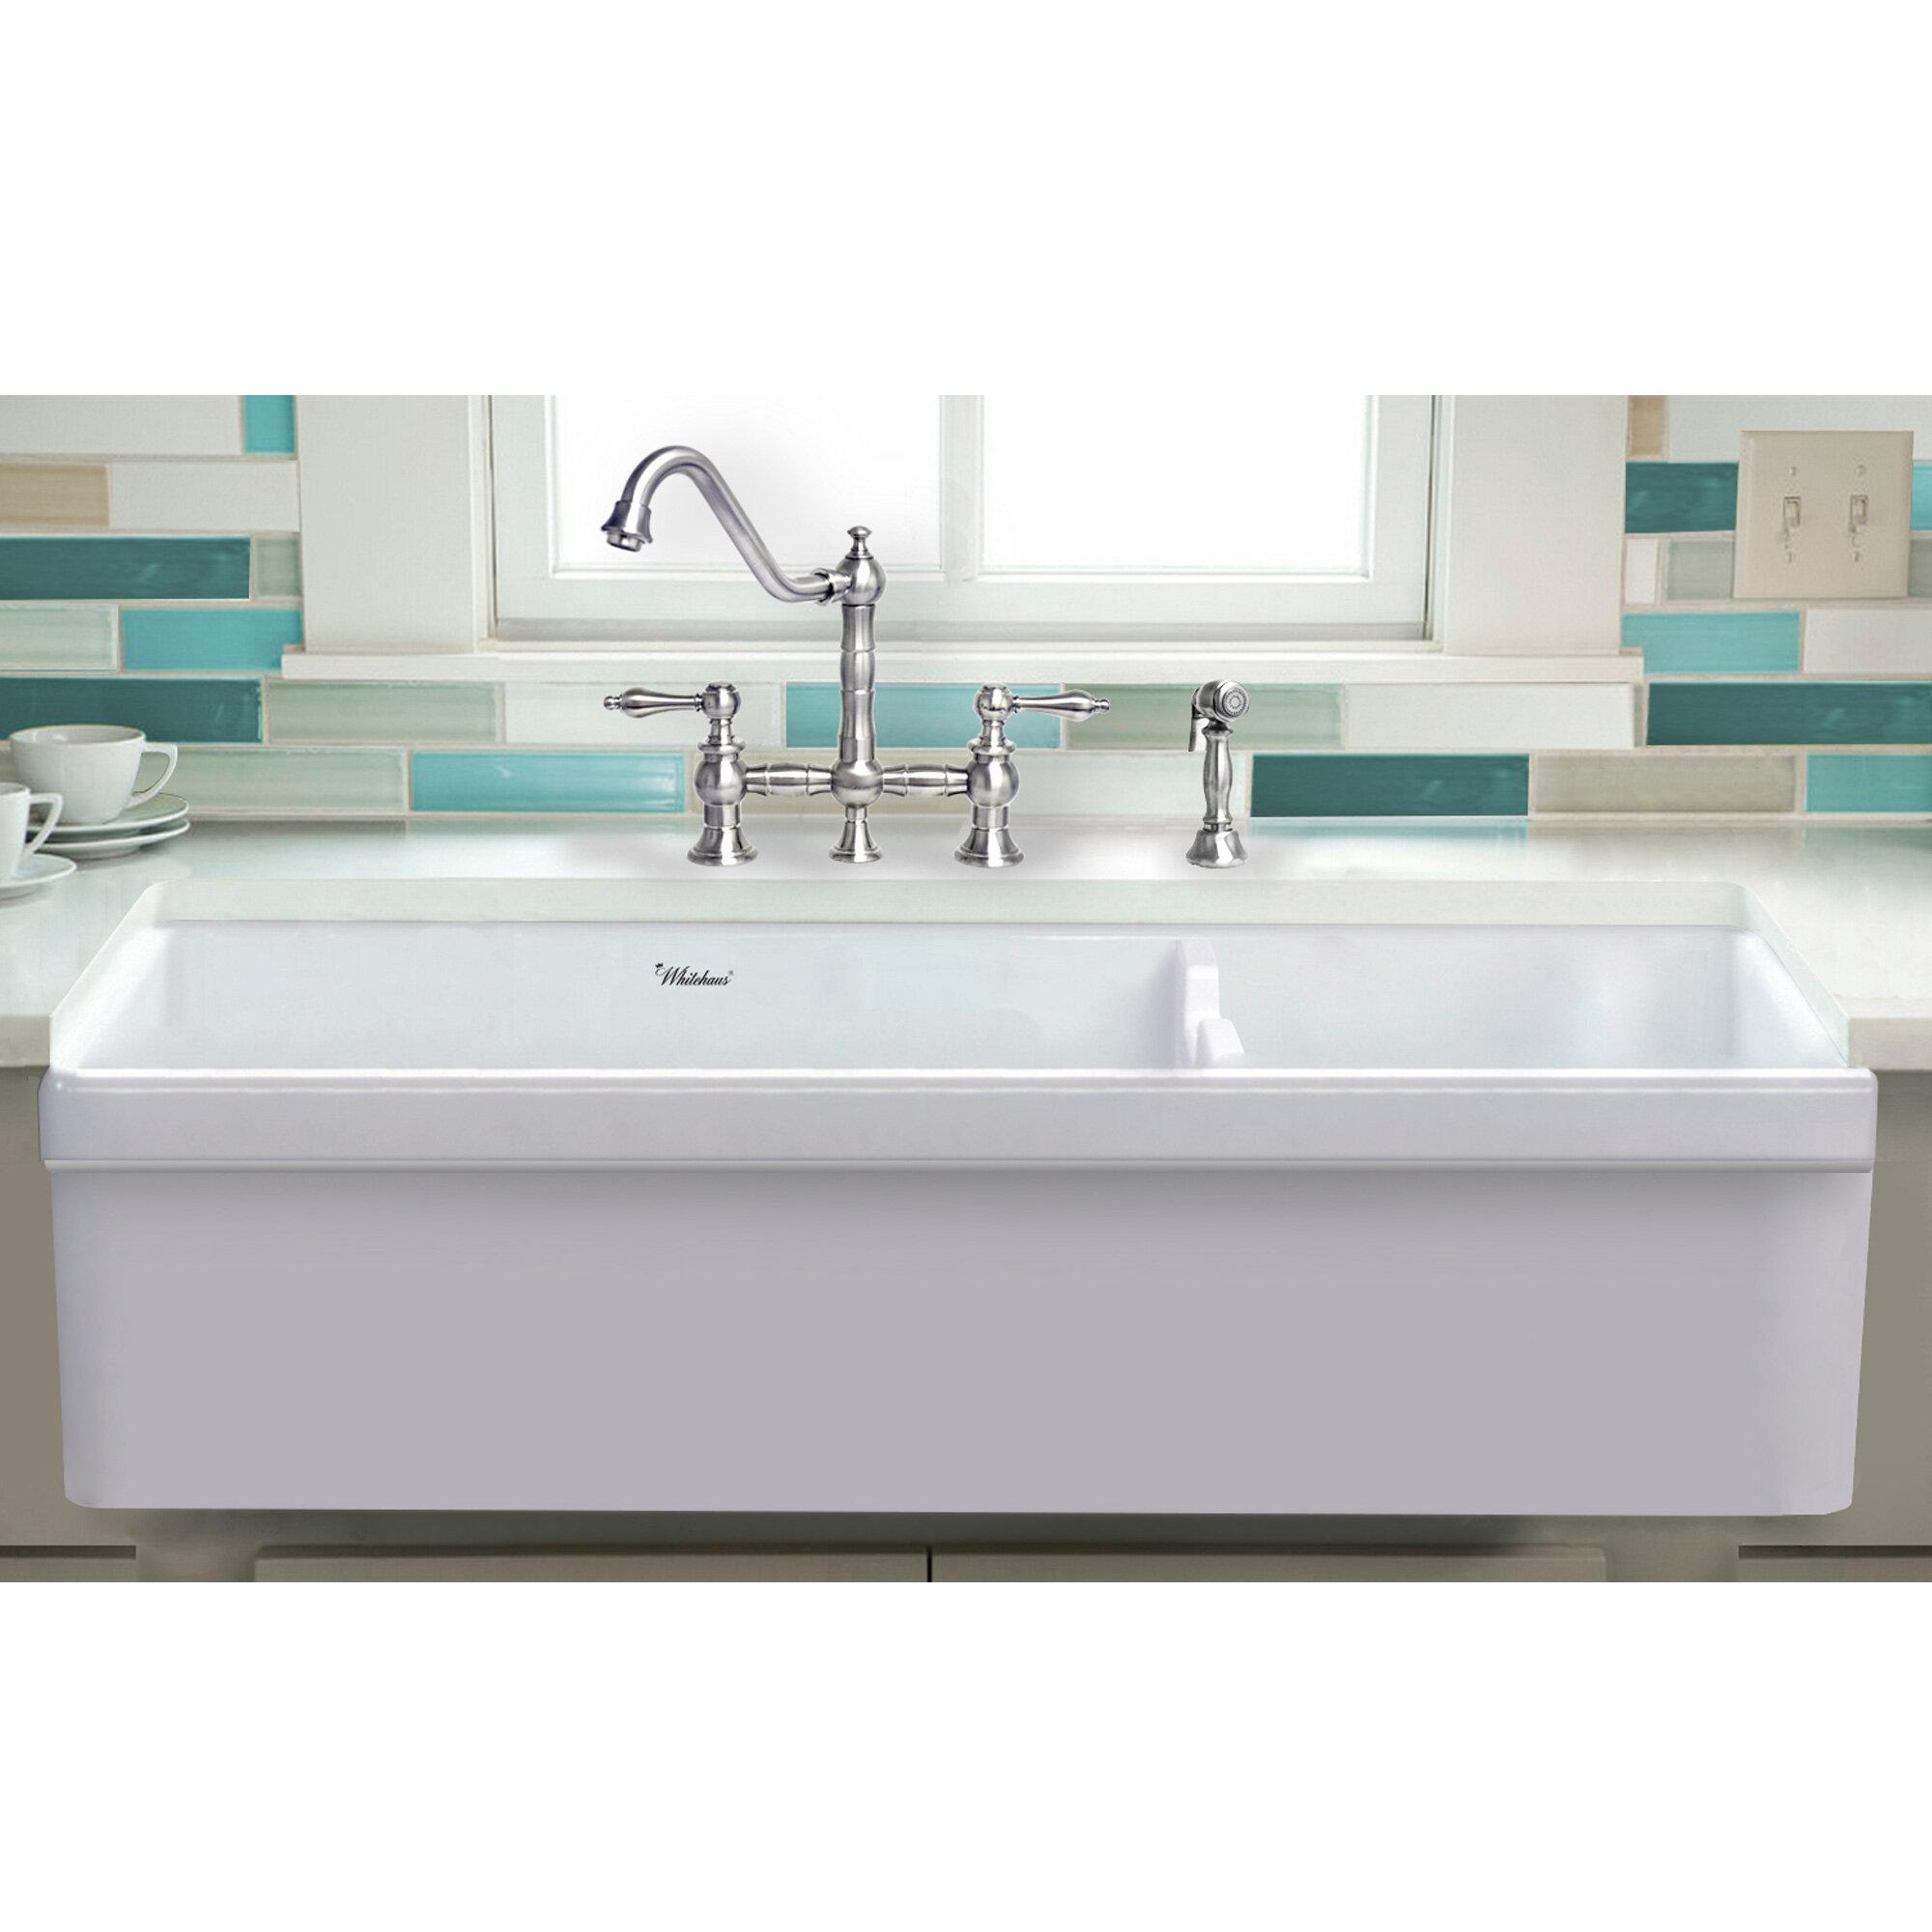 Picture of: Whitehaus Collection Glencove 42 L X 19 W Double Basin Farmhouse Apron Kitchen Sink Reviews Wayfair